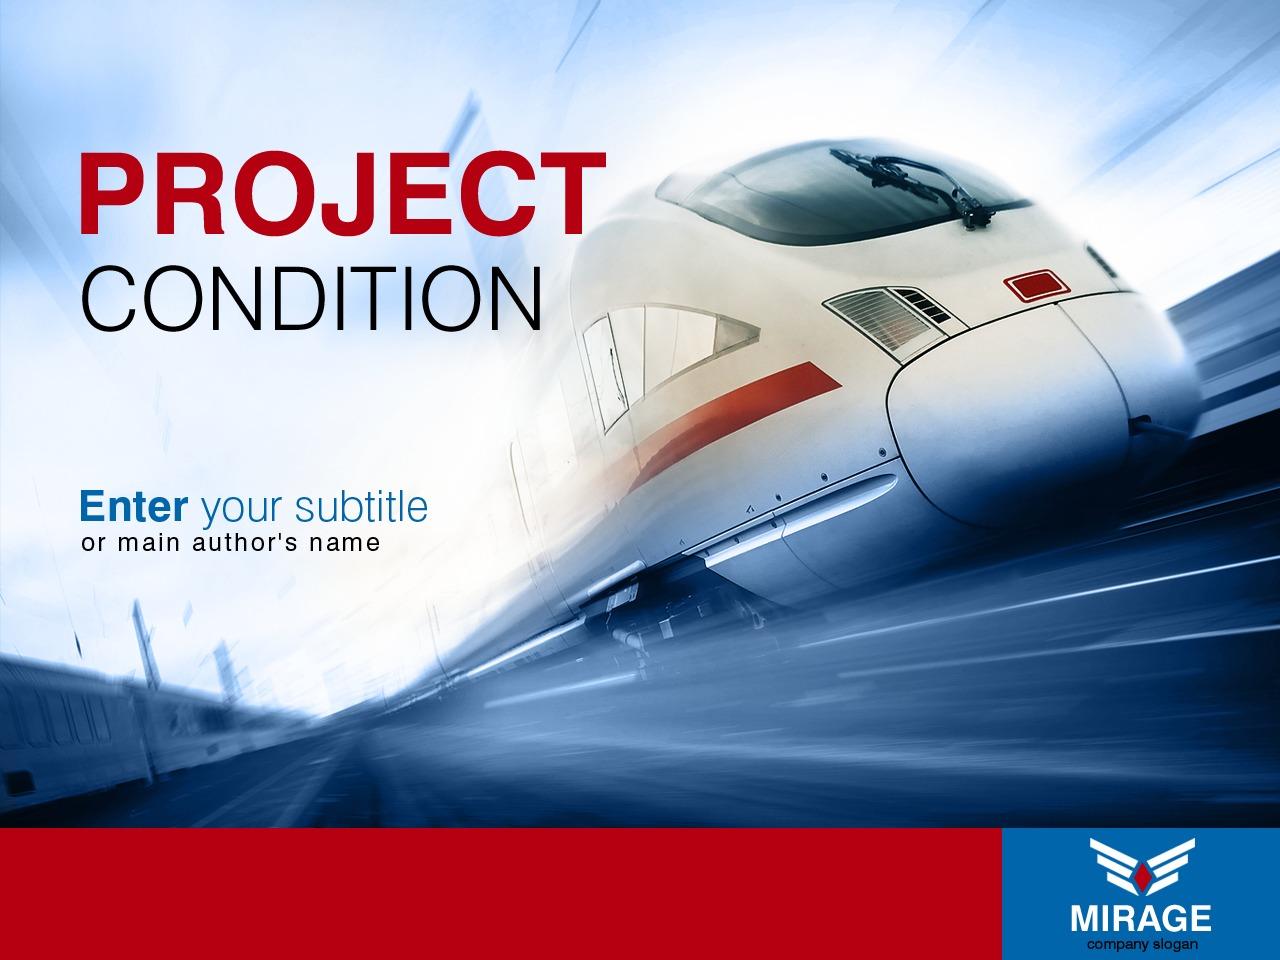 Szablon PowerPoint #32247 na temat: transport